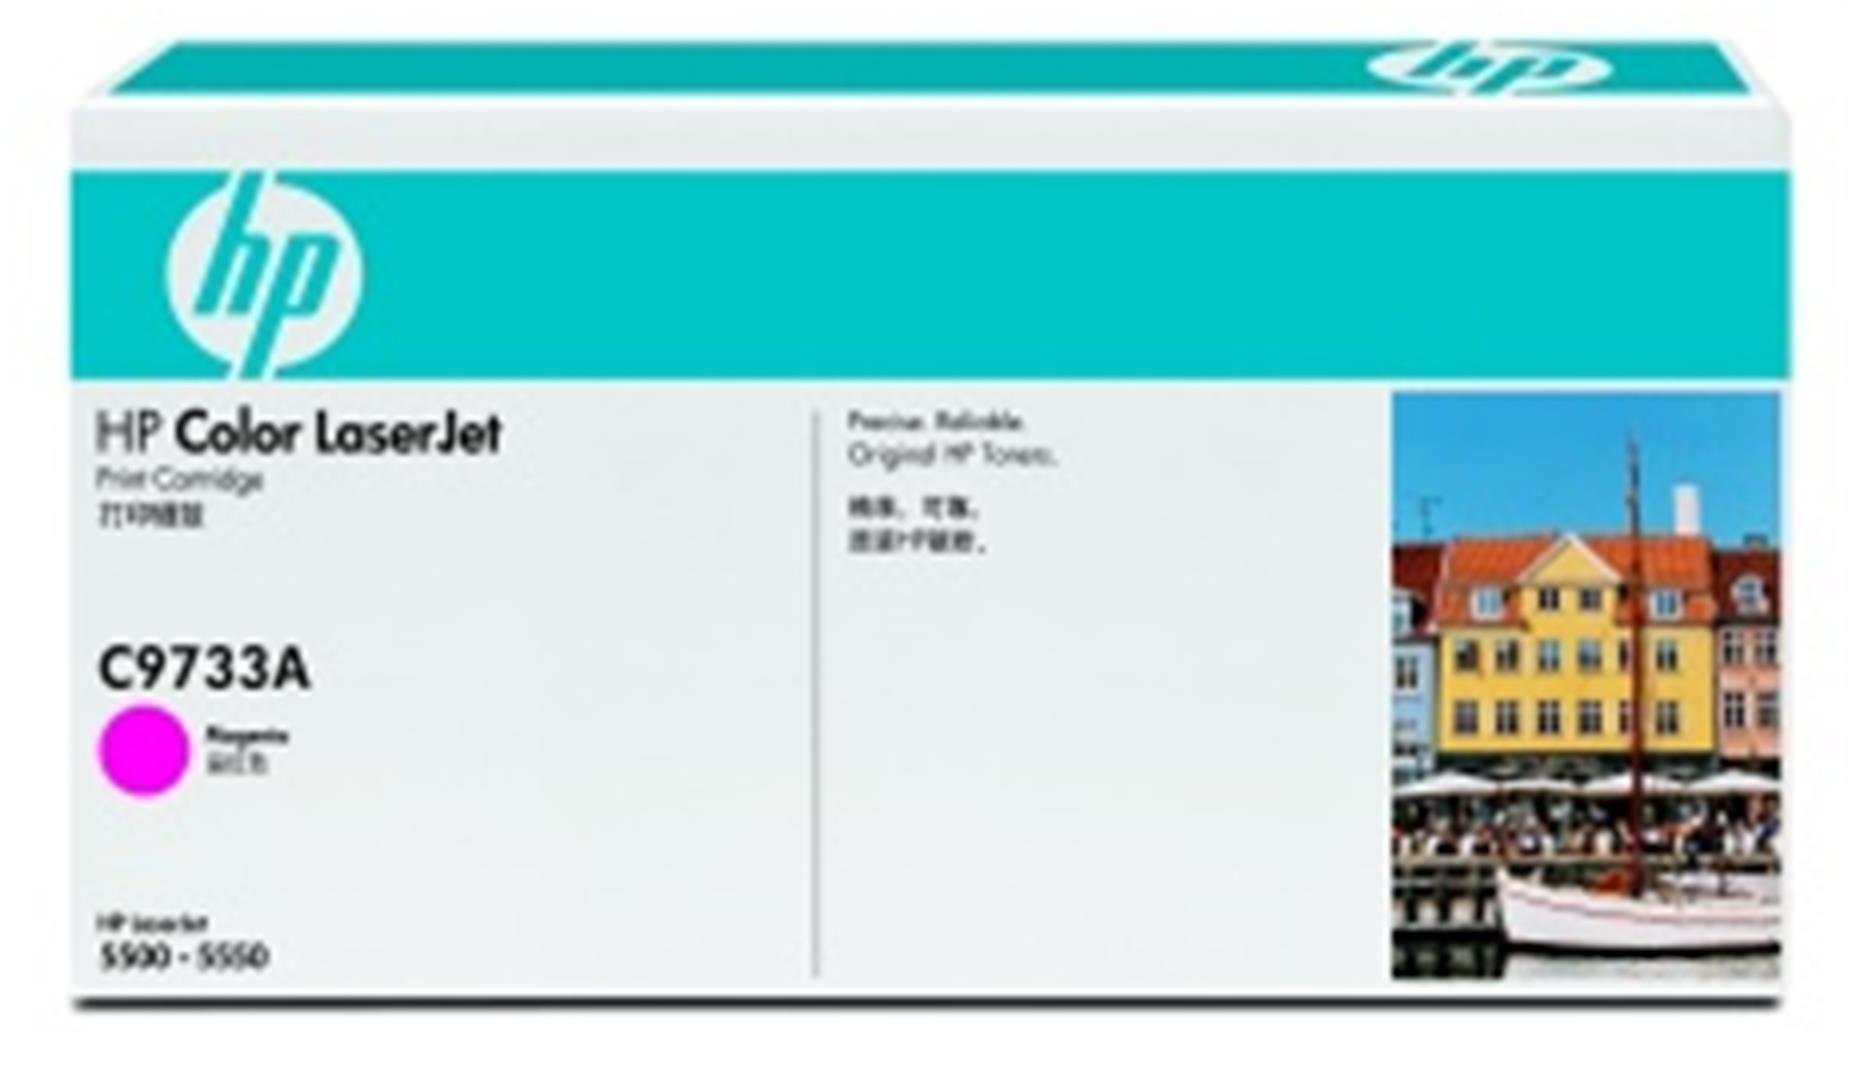 HP Color LaserJet purpurový toner, C9733A